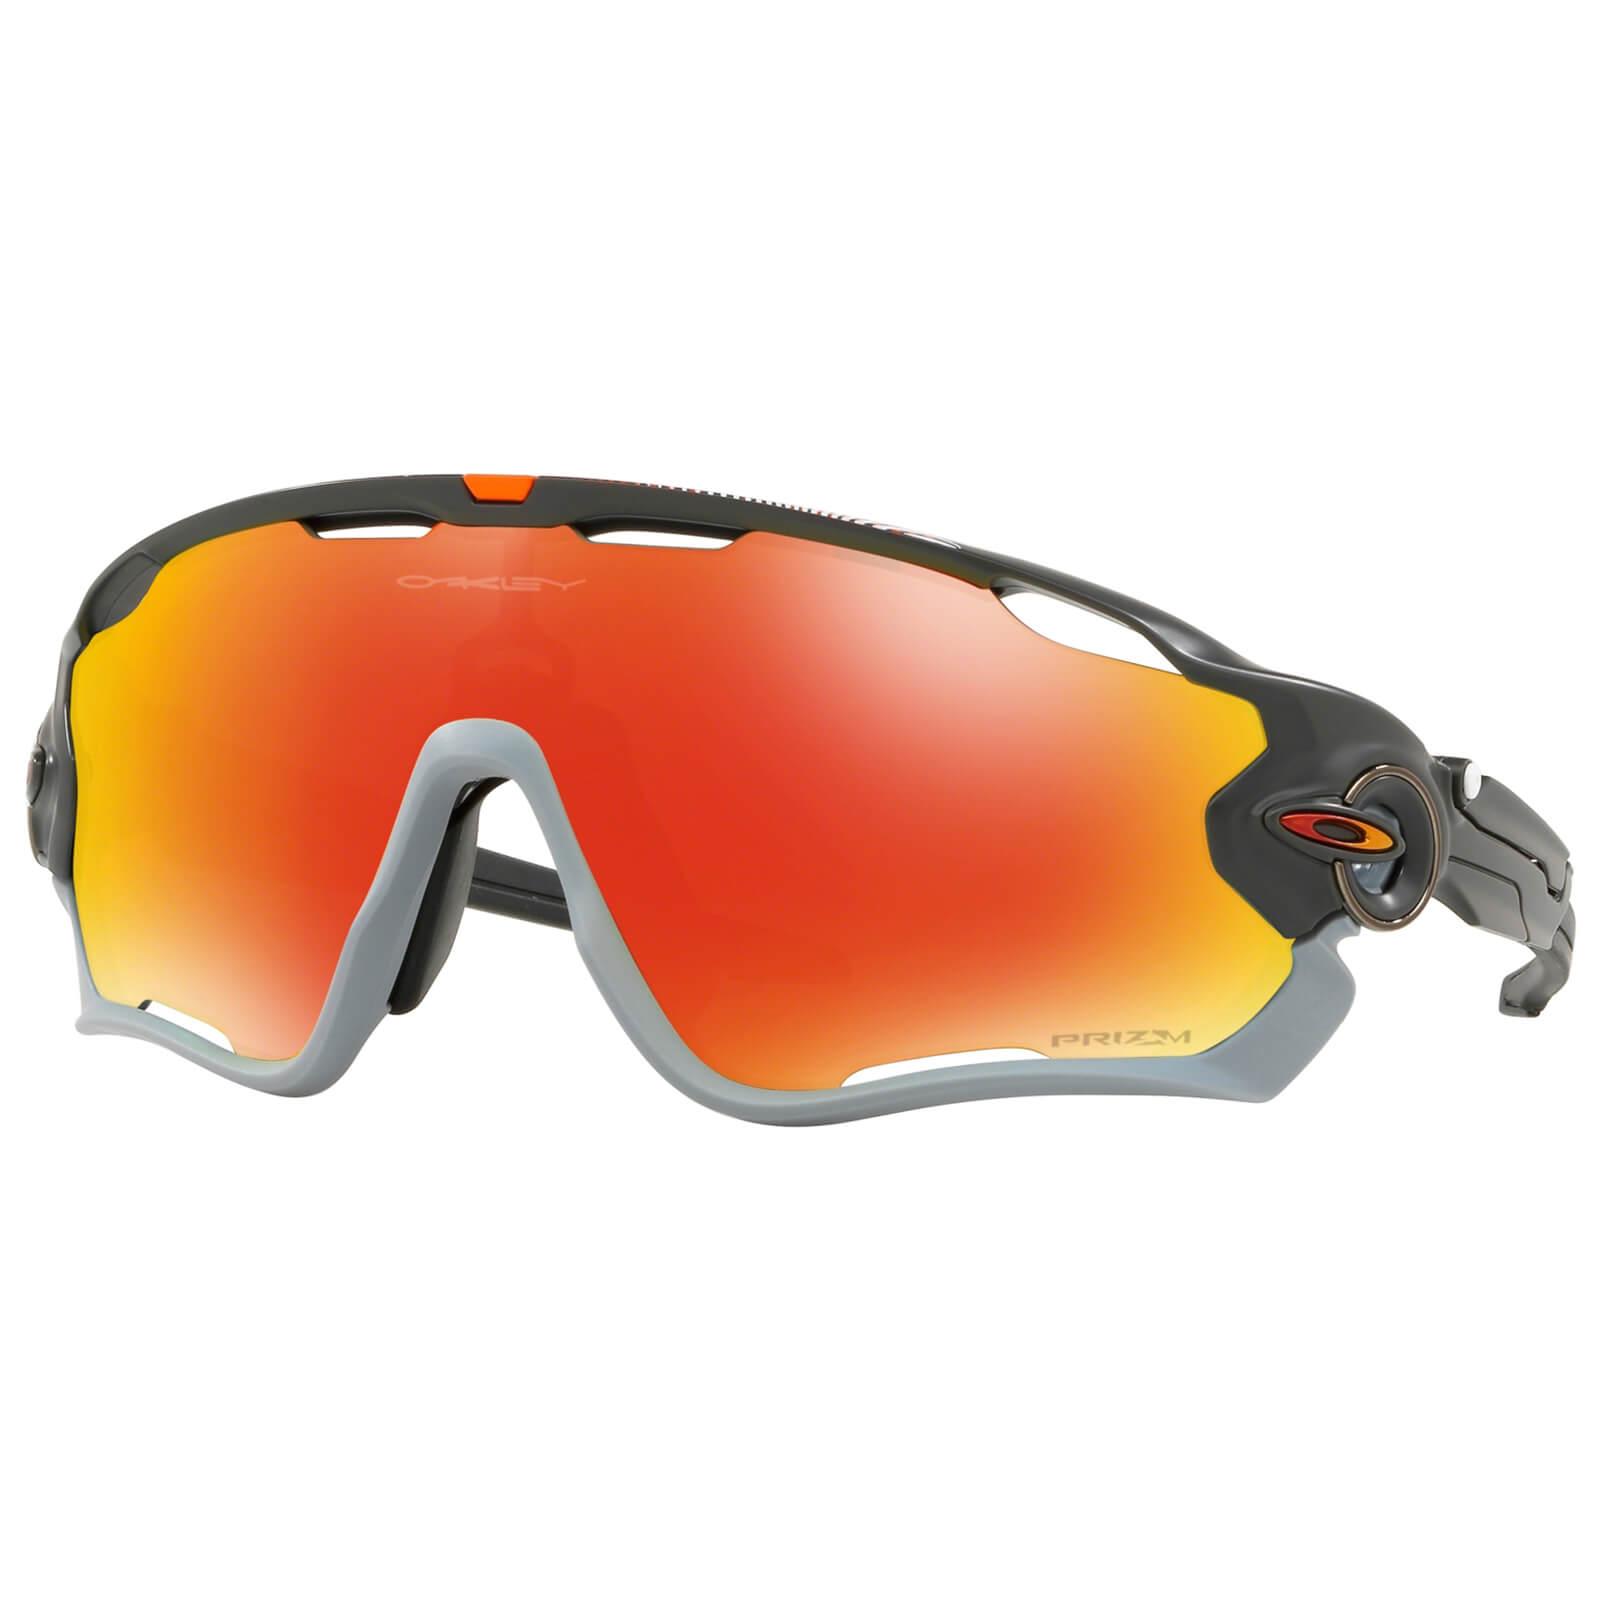 b809b06676 Oakley Jawbreaker Sunglasses - Matt Carbon Prizm Ruby